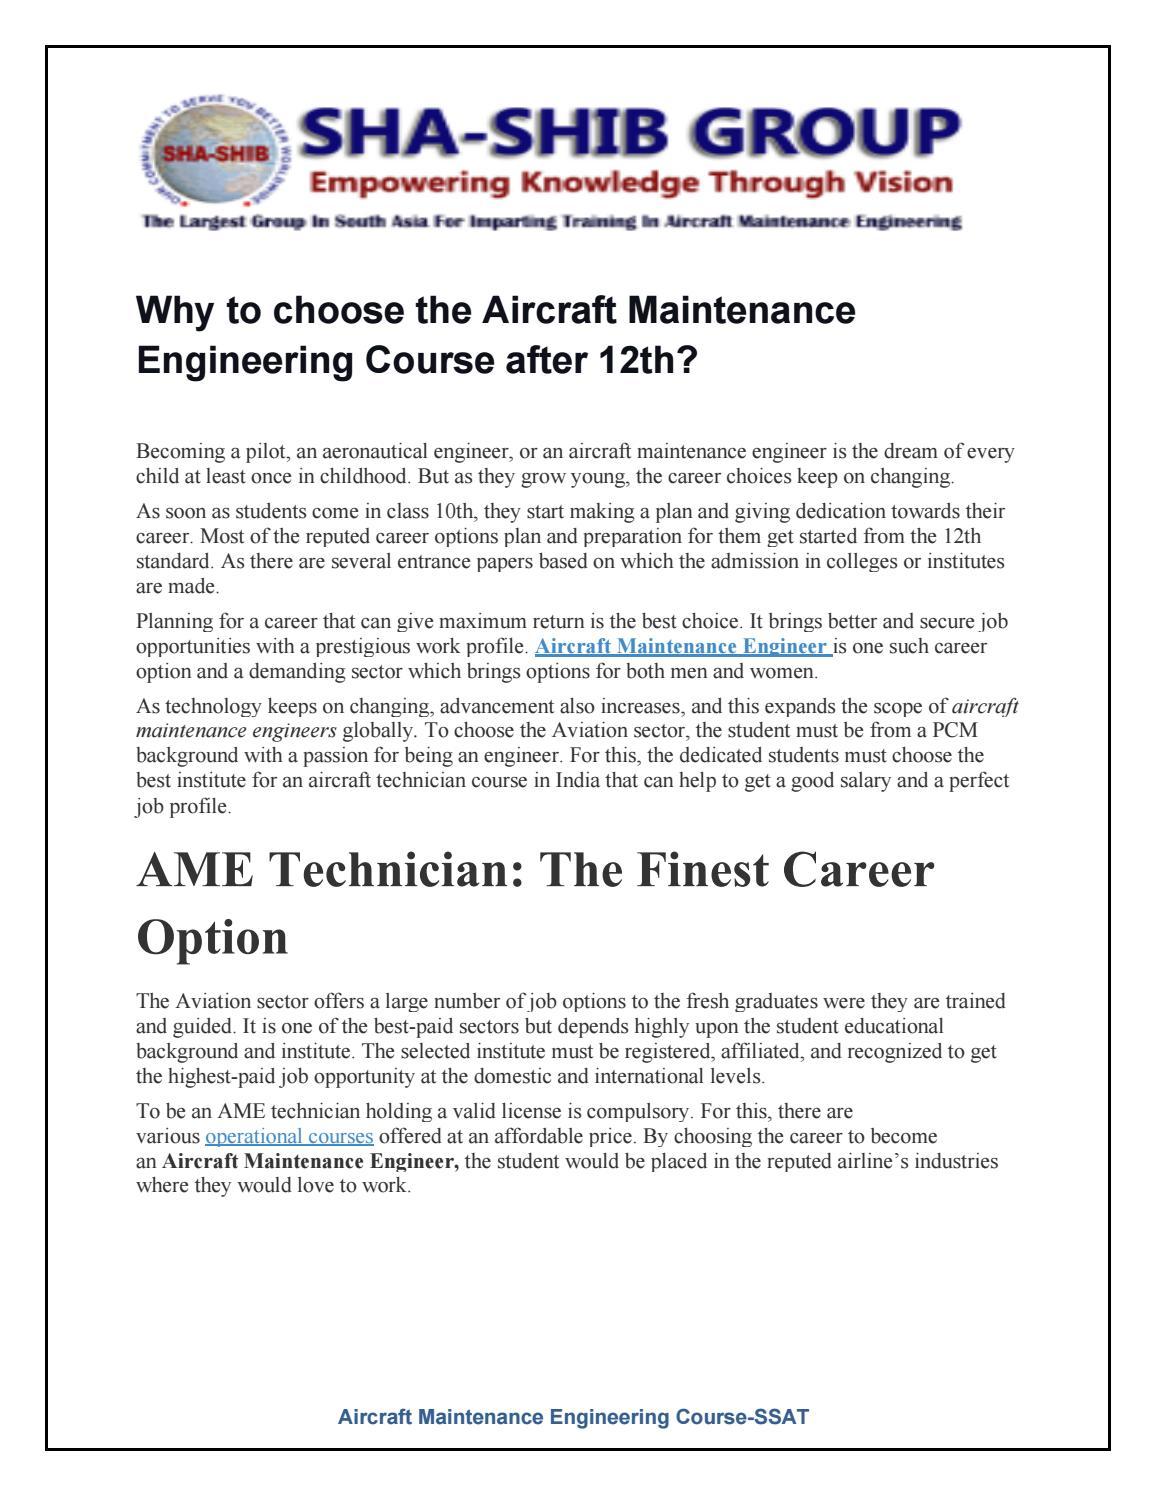 Aircraft Maintenance Engineering Course Ssat By Shashibgroup91 Issuu